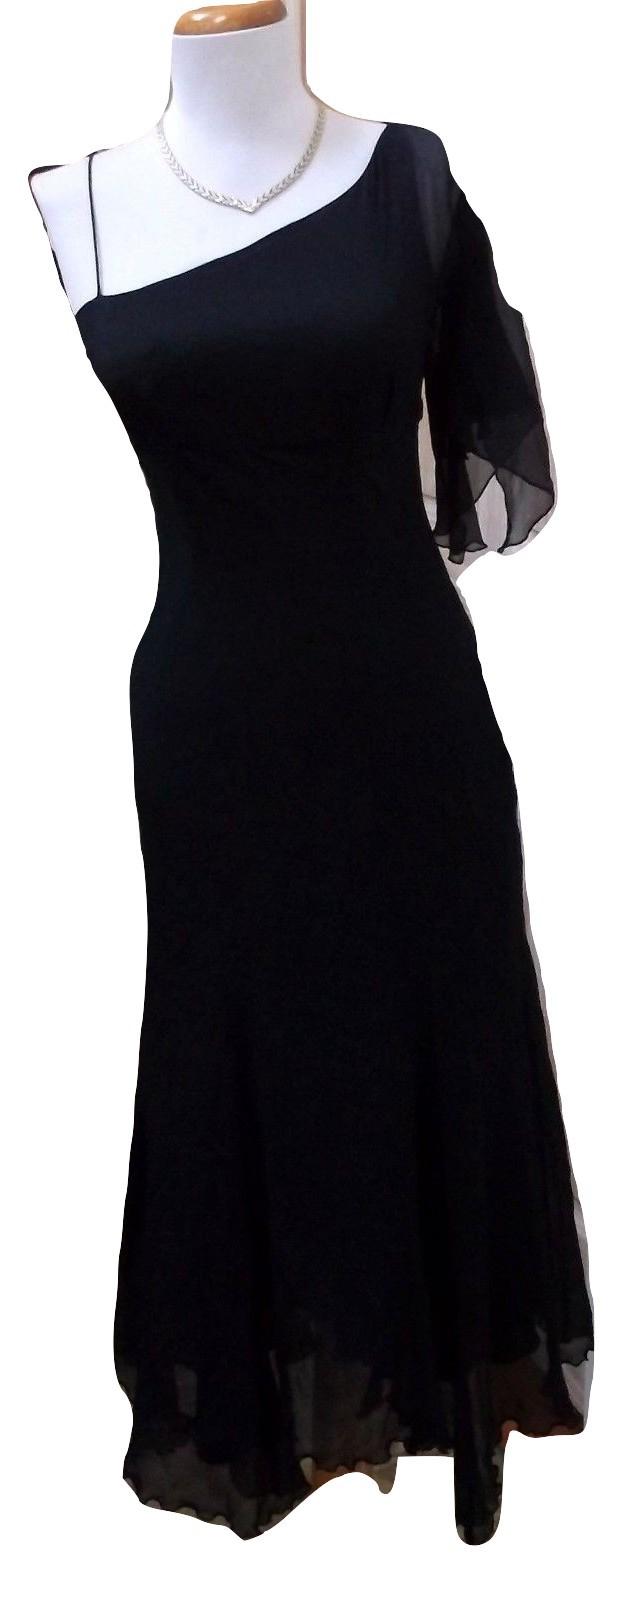 NWT - EXPRESS Ladies' Black 100% Silk One Shoulder Asymmetric Dress Size 1/2 - $34.99